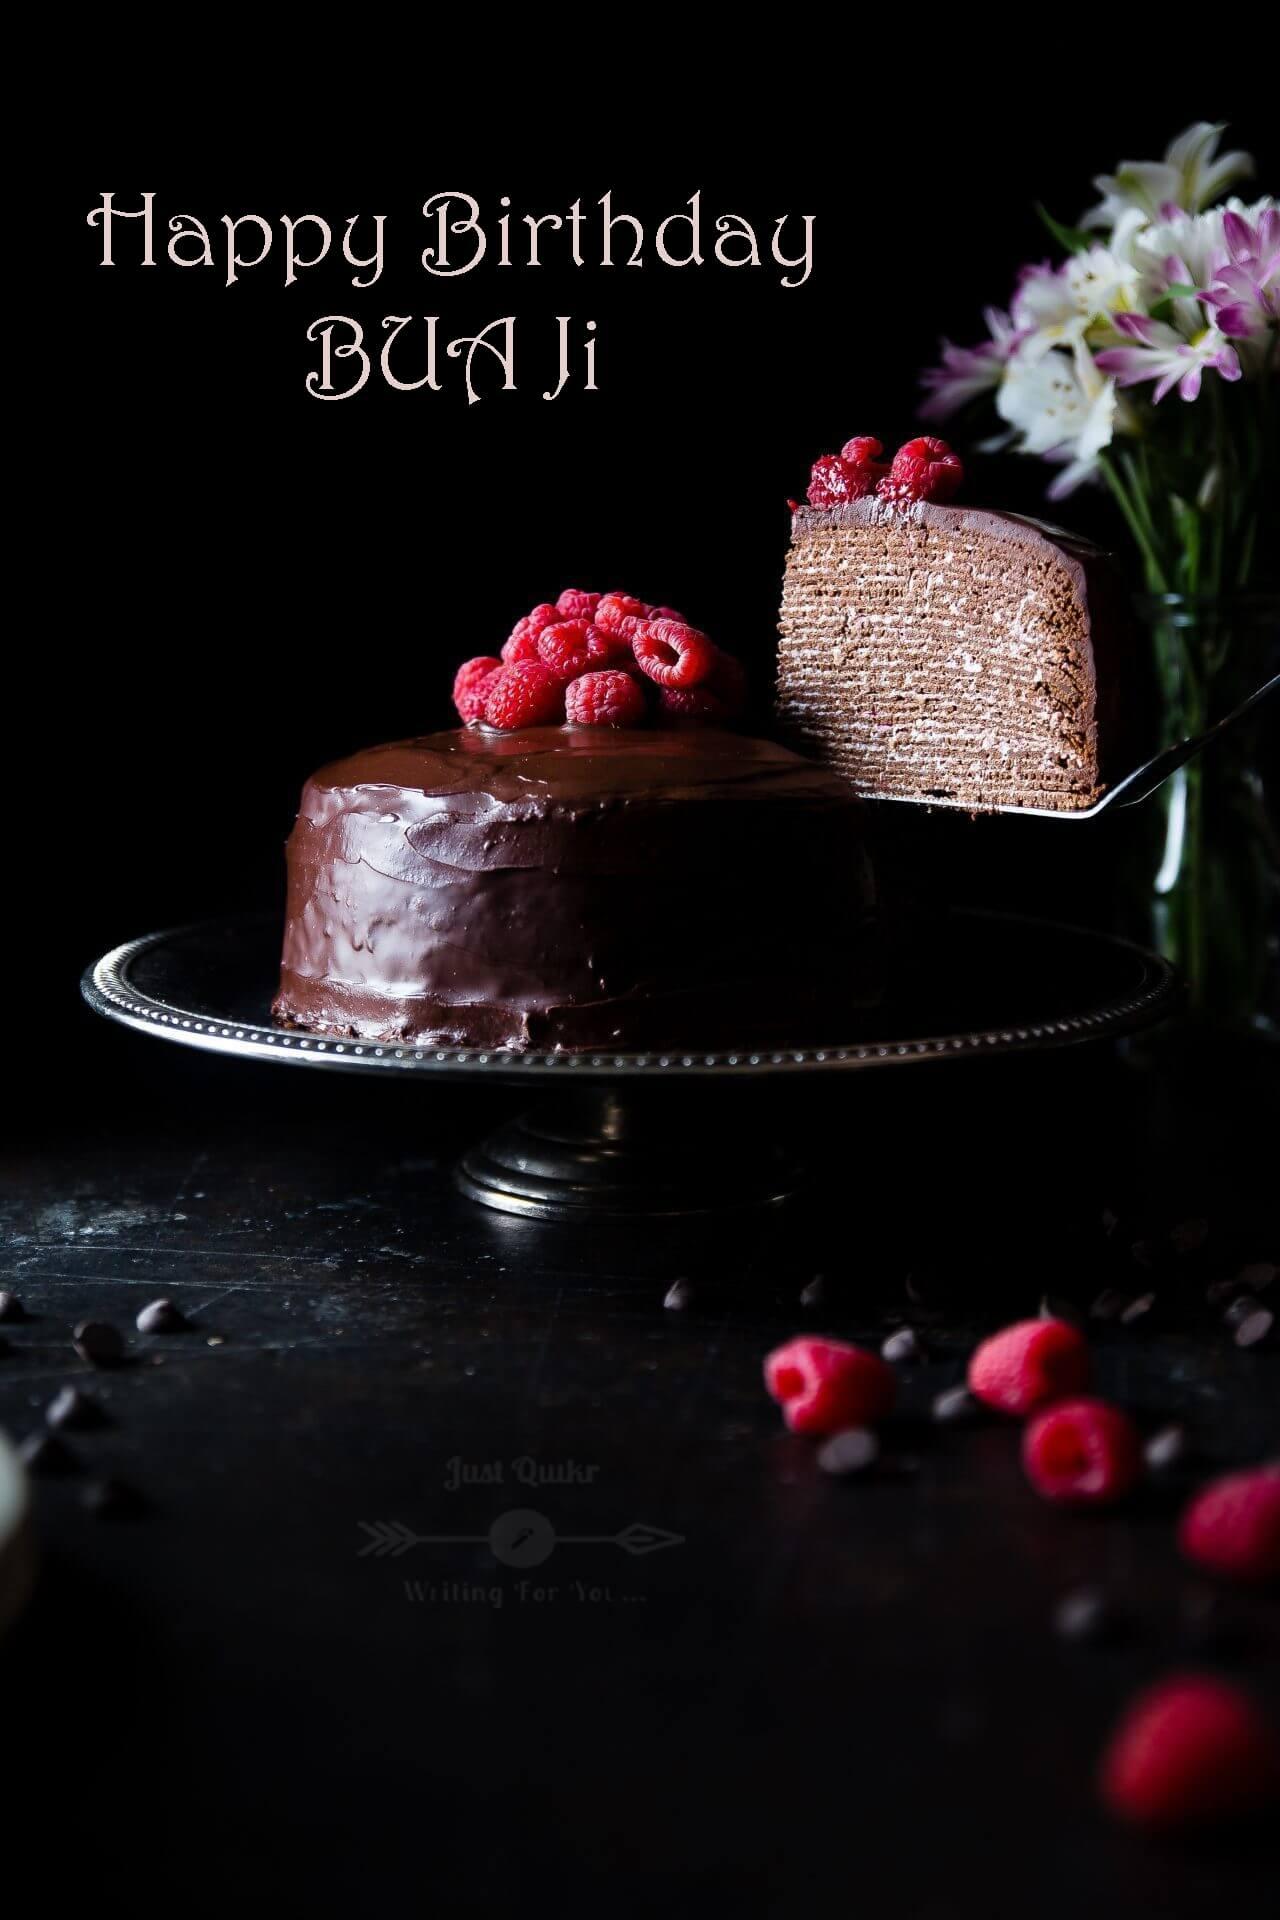 Special Unique Happy Birthday Cake HD Pics Images for Bua Ji